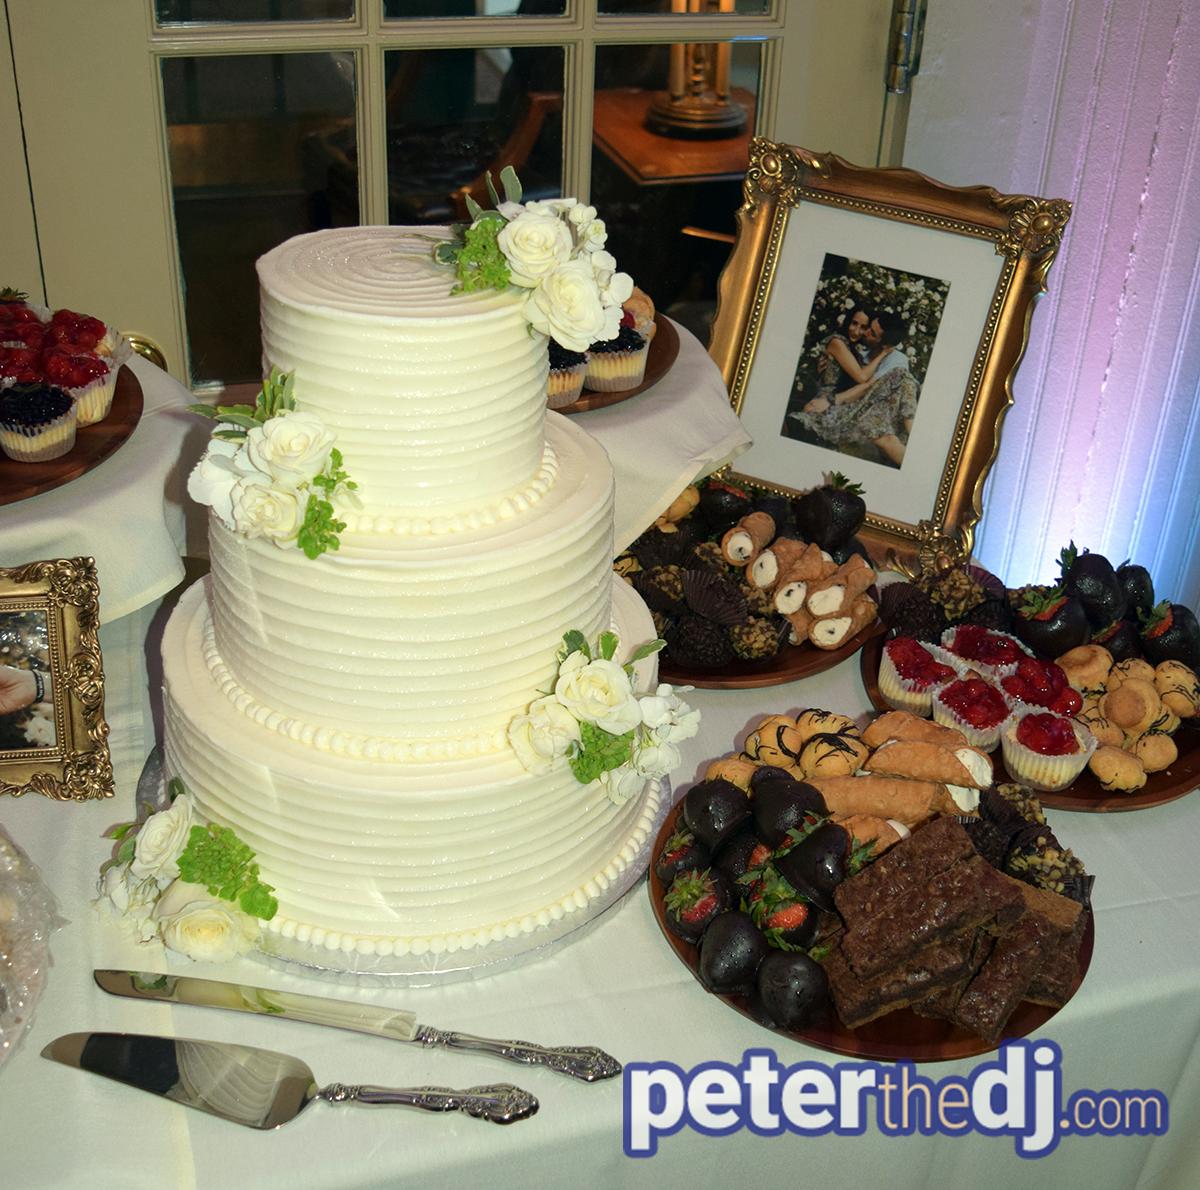 Wedding: Jenna and David at Sherwood Inn, Skaneateles, 7/10/21 6